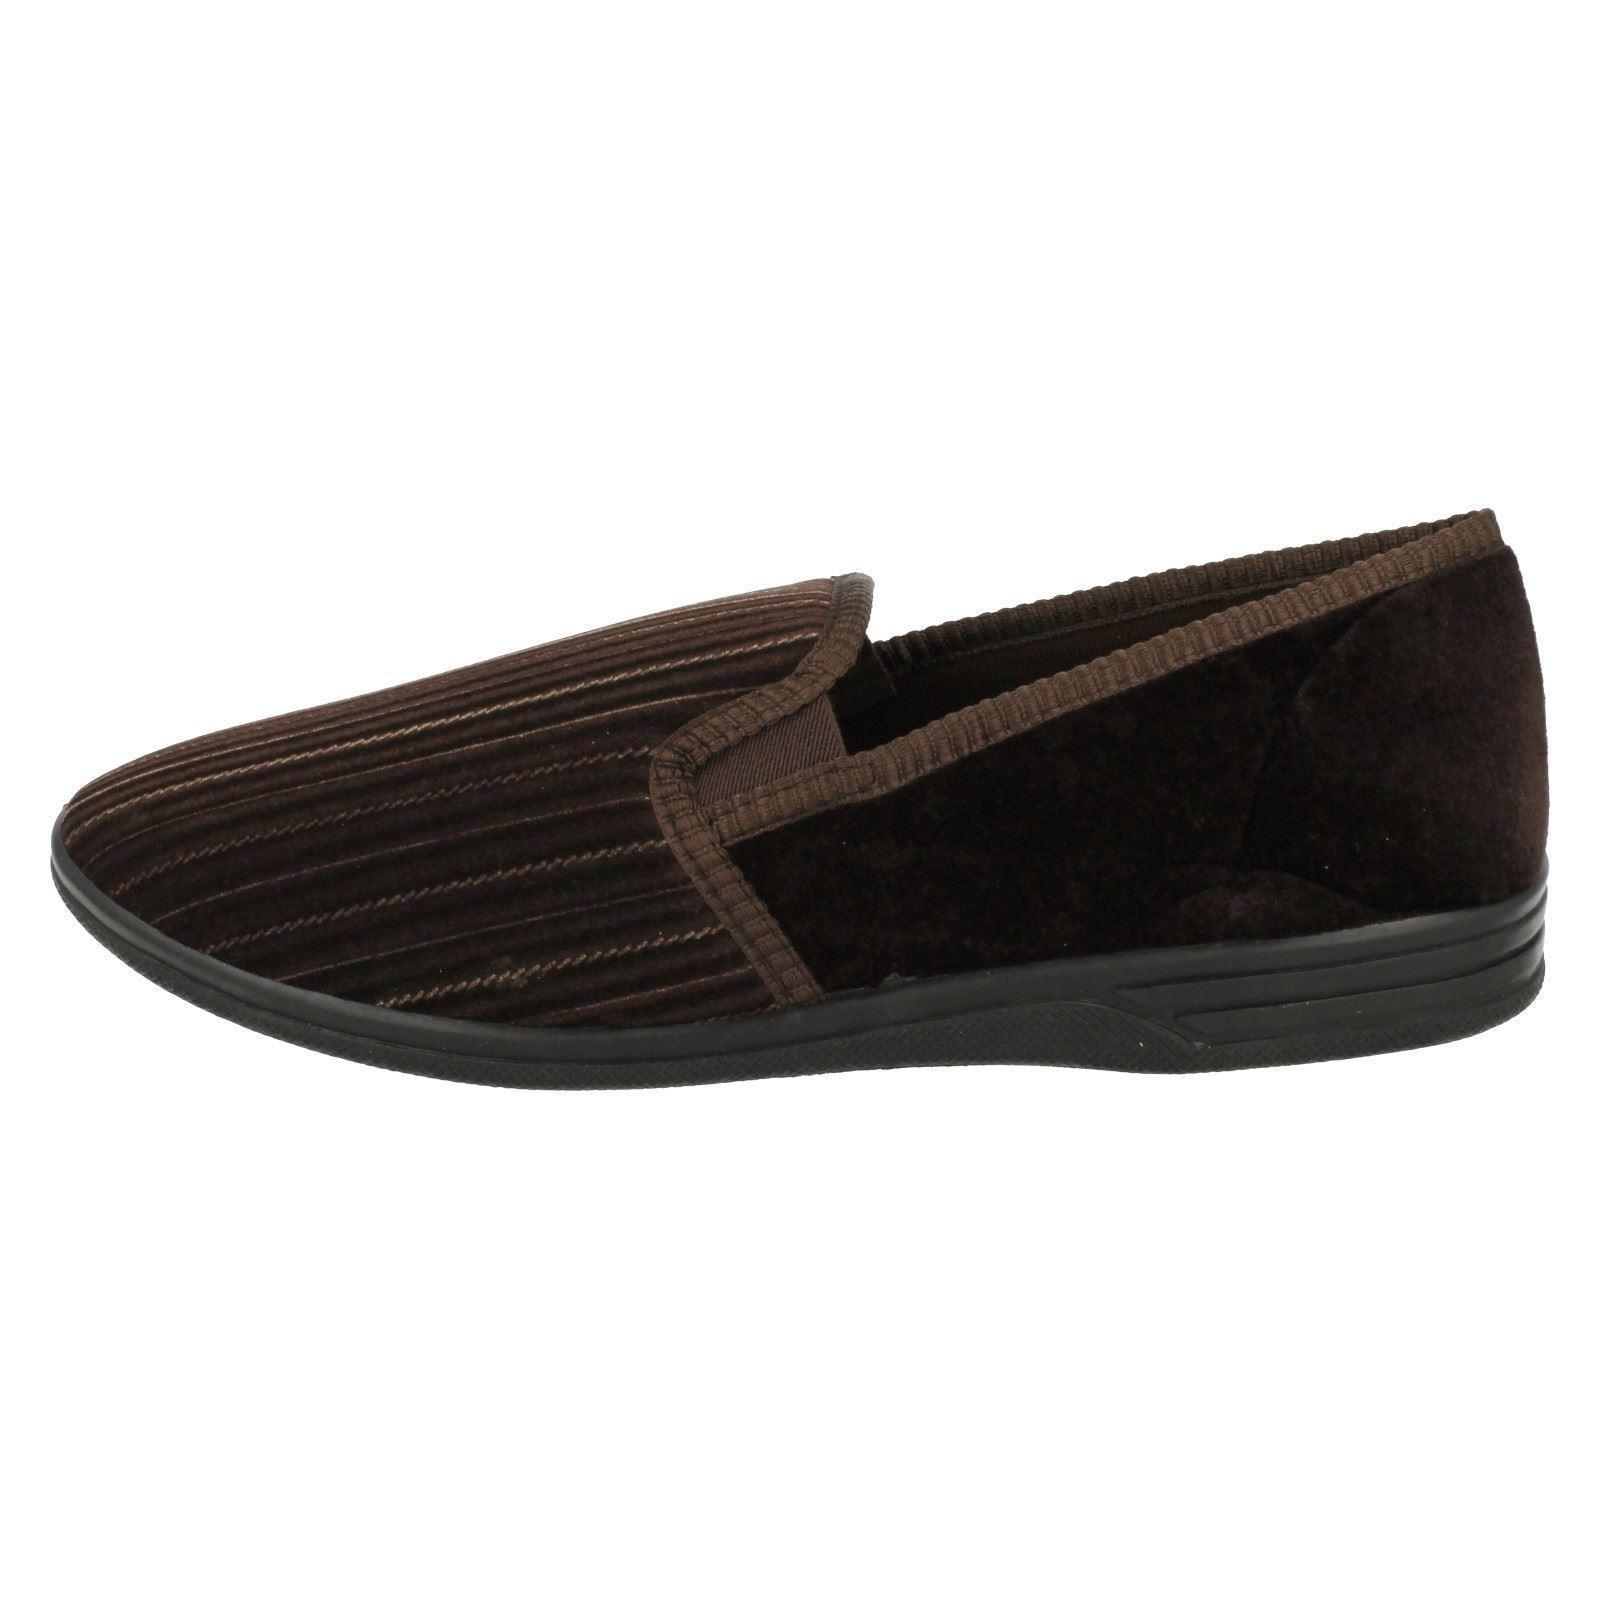 Da Uomo Marrone/burgundy Four Seasons Pantofole Taglie Uk 6-12 Bruce Clothing, Shoes & Accessories Men's Shoes